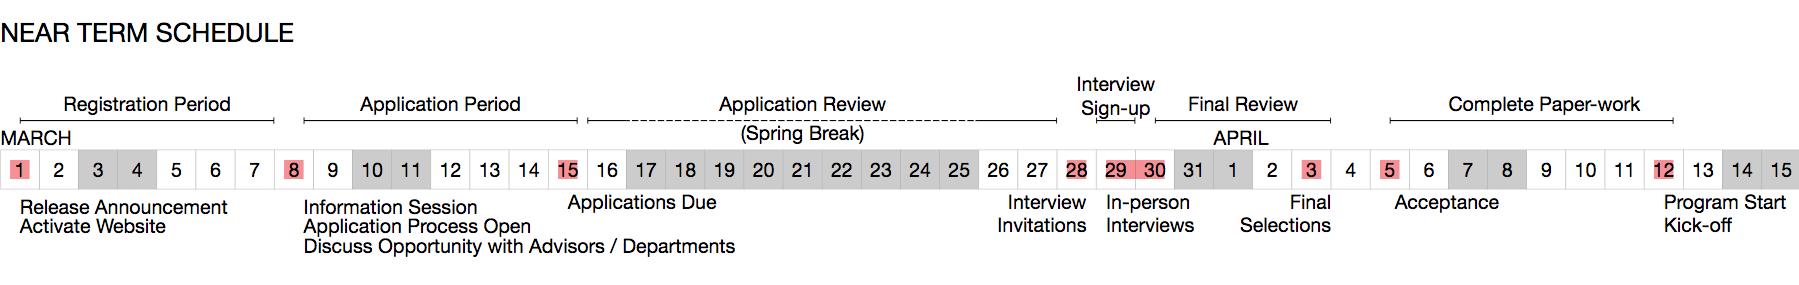 NT schedule